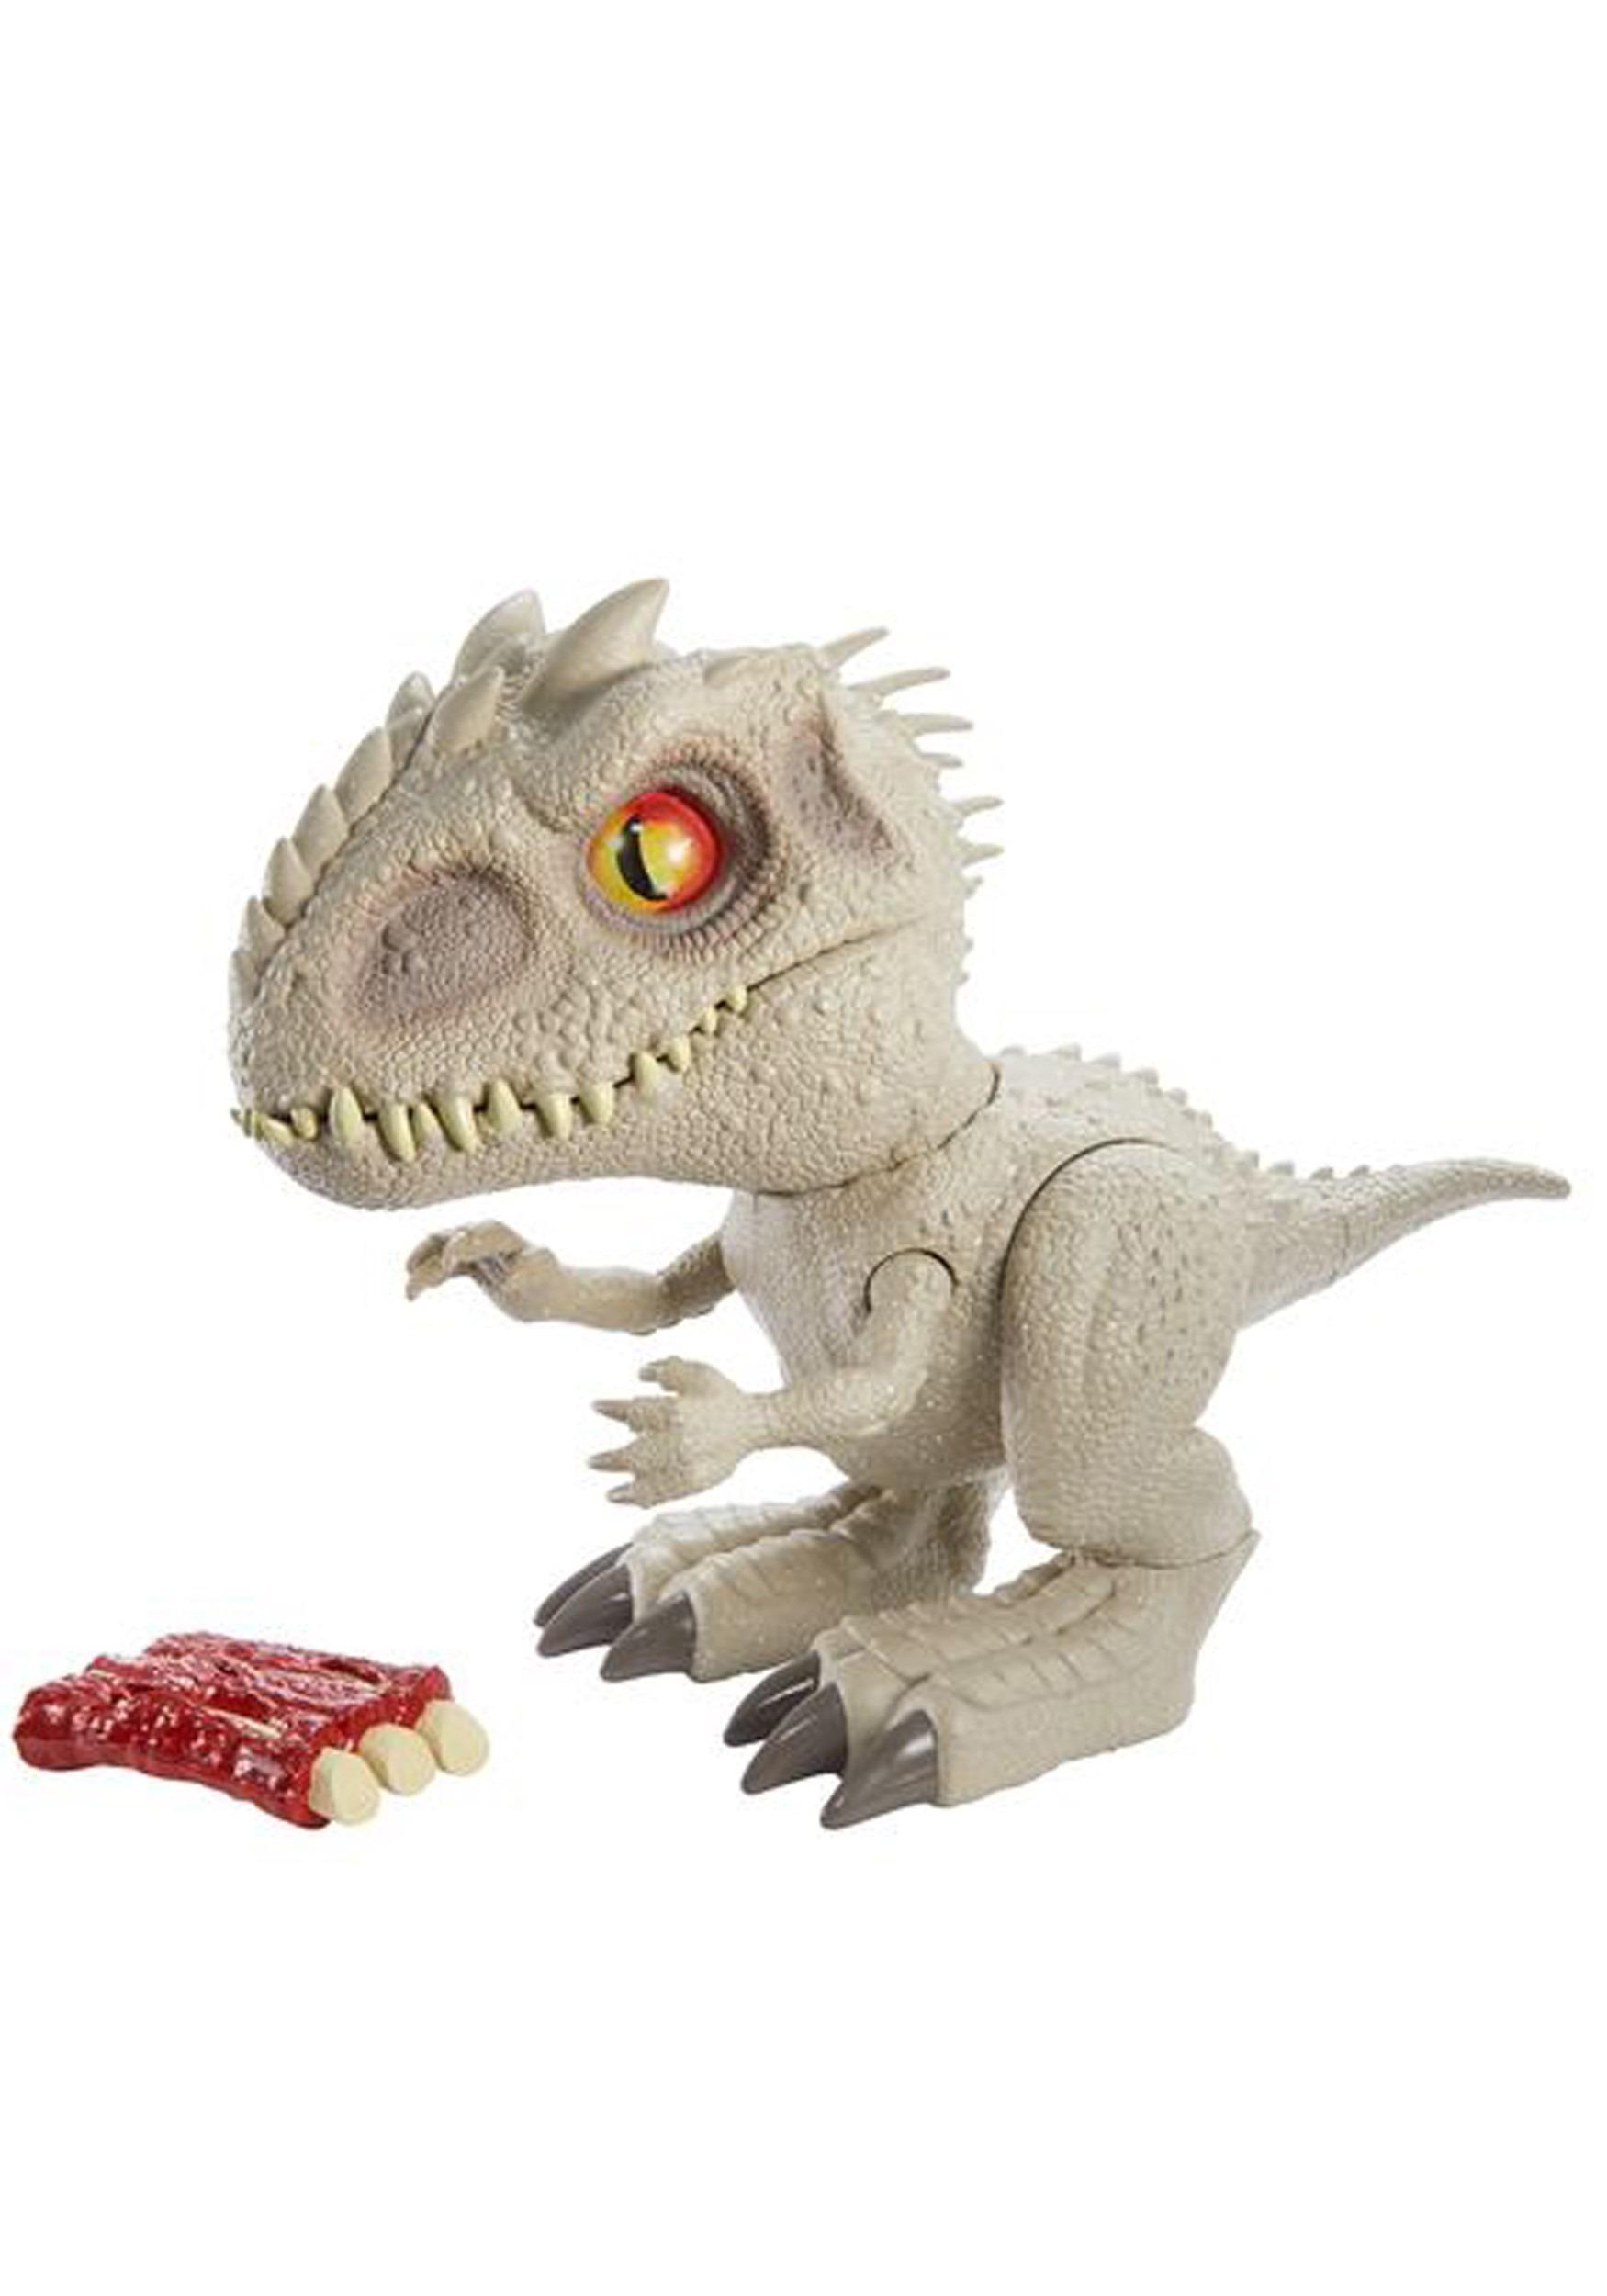 Mattel Jurassic World Feeding Frenzy Indominus Rex Toy